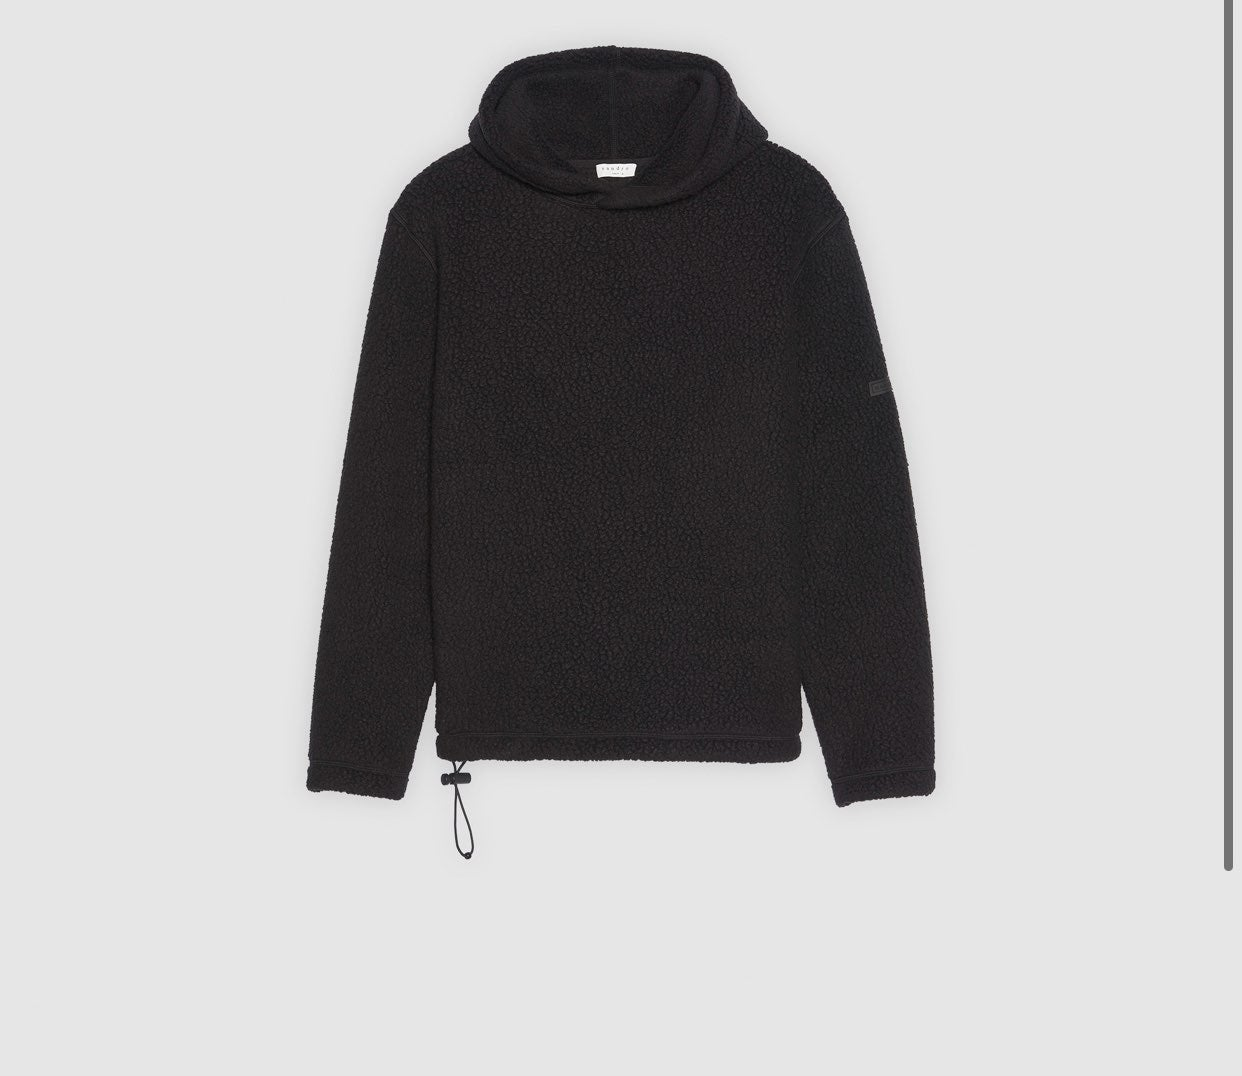 Sandro Polartec Black Fleece Hoodie - XL